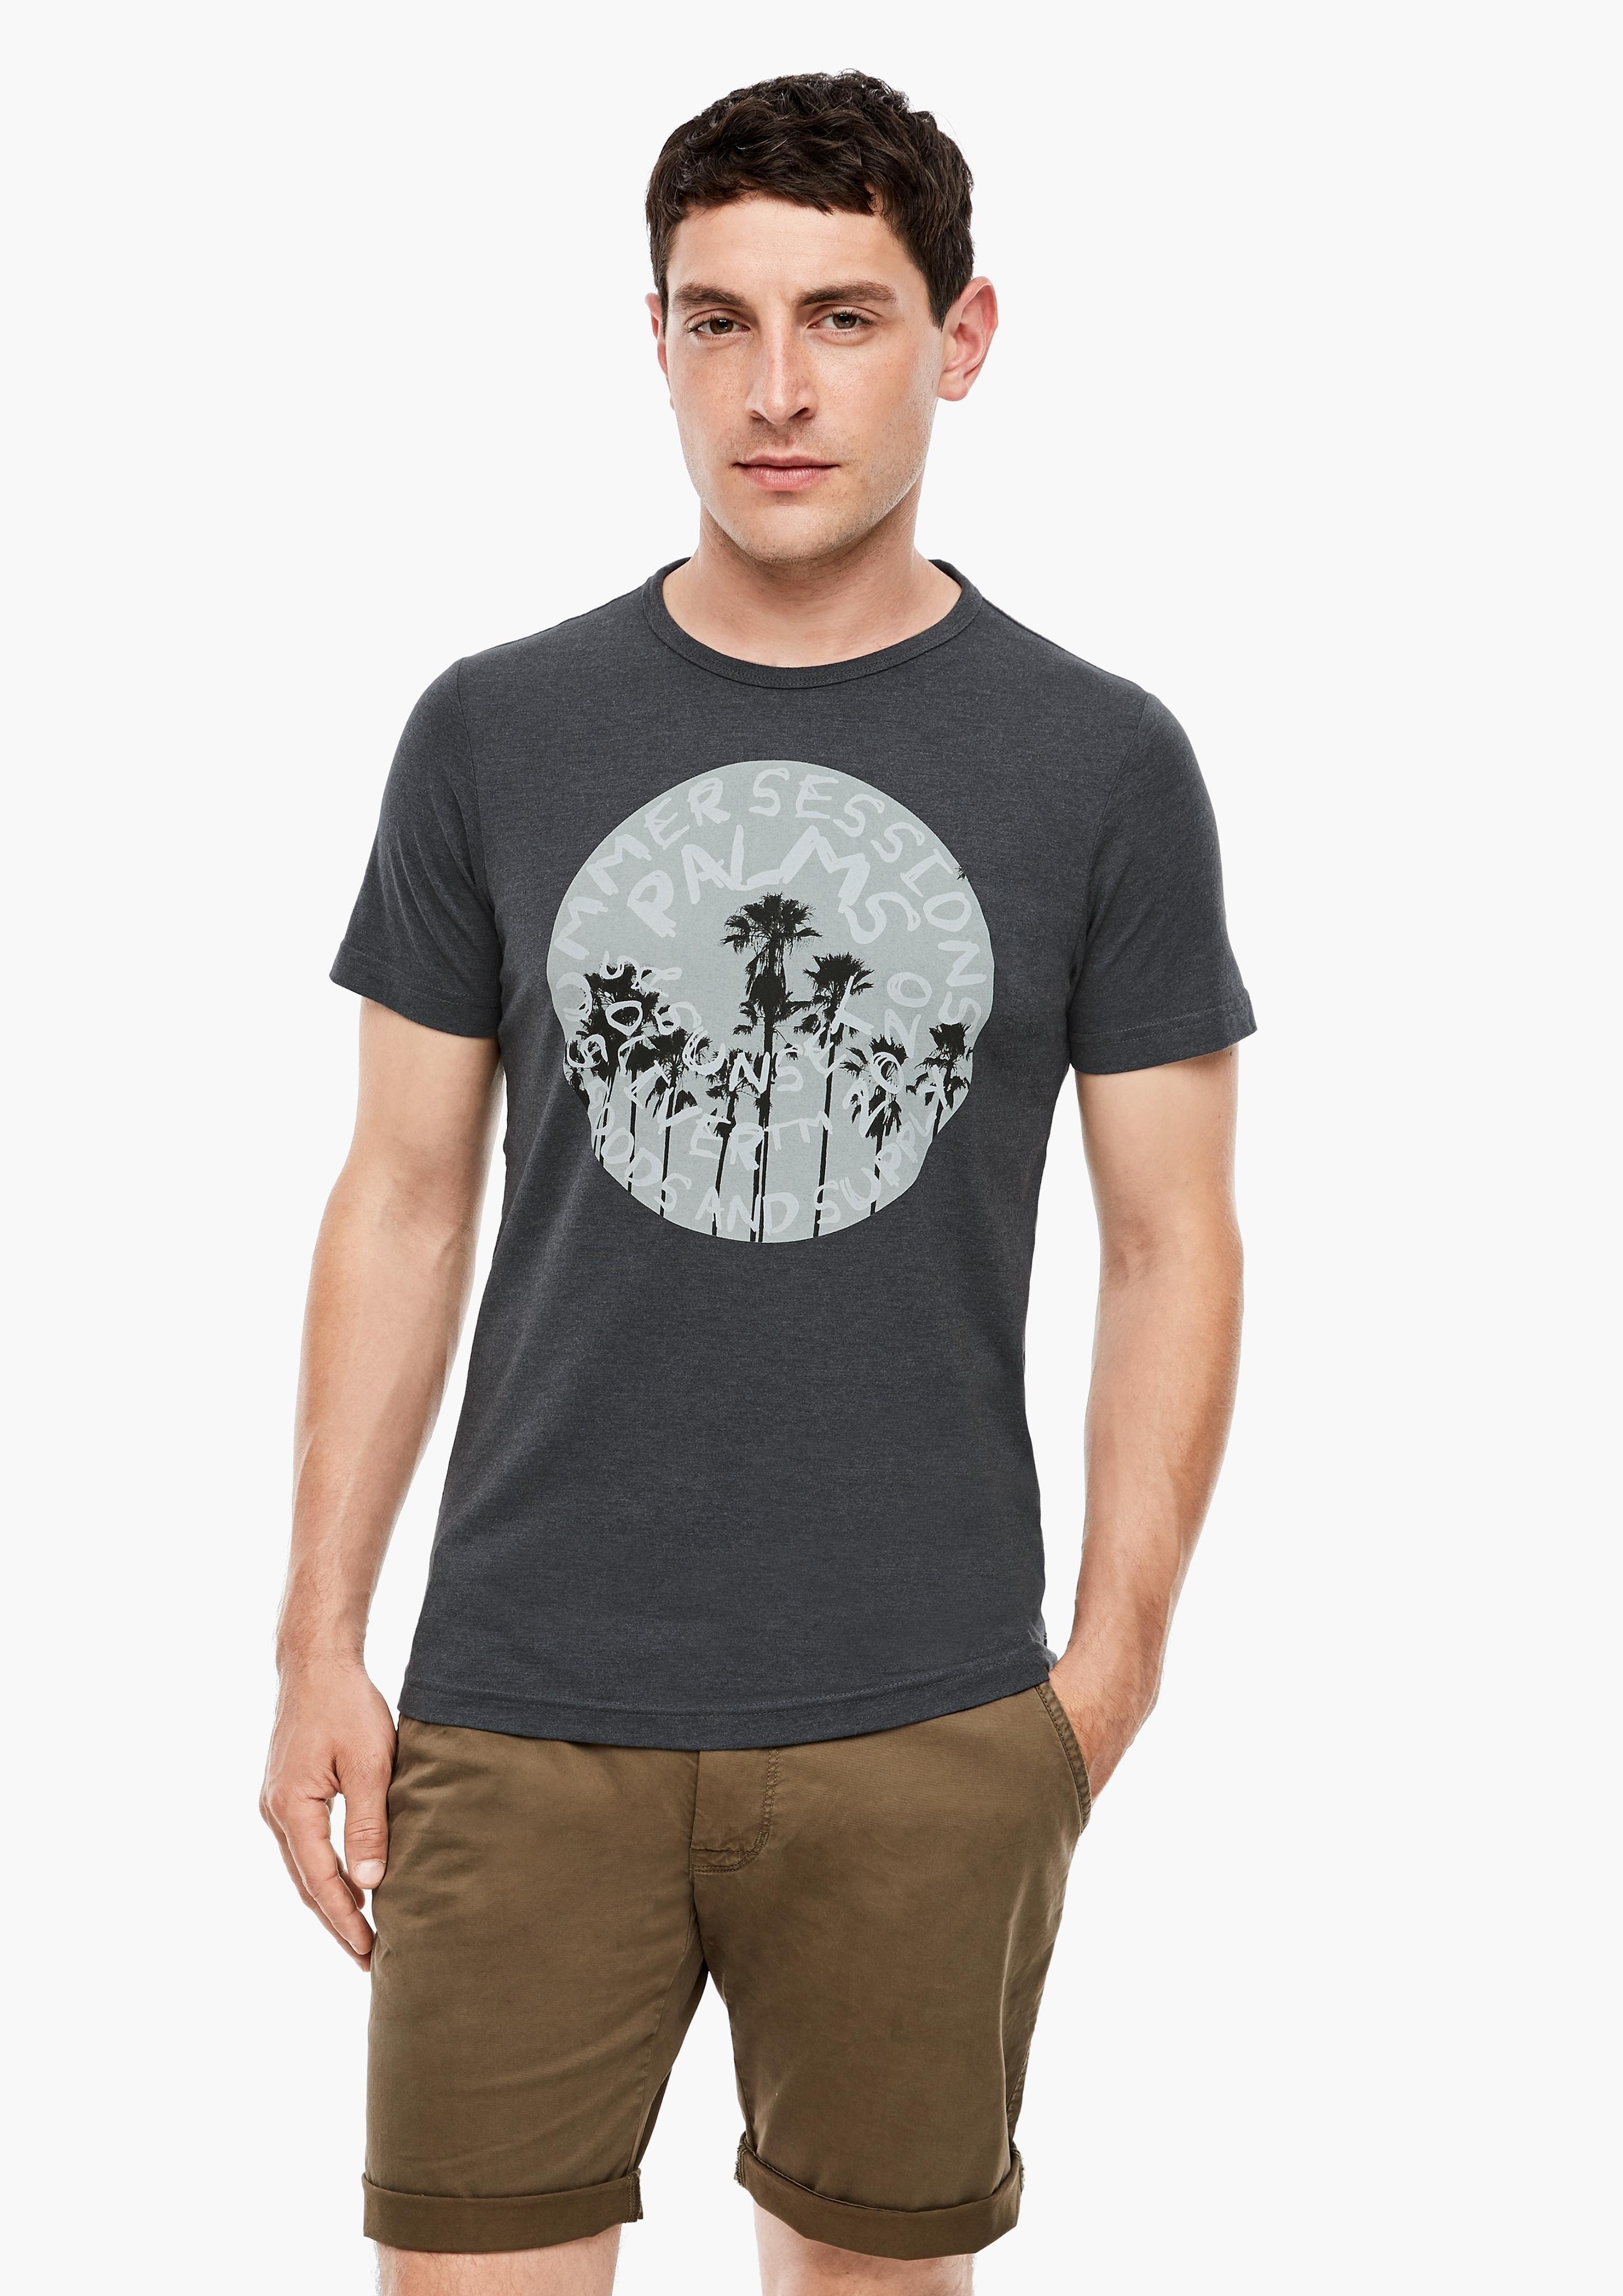 s.Oliver RED LABEL s.Oliver T-shirt bestellen: 30 dagen bedenktijd